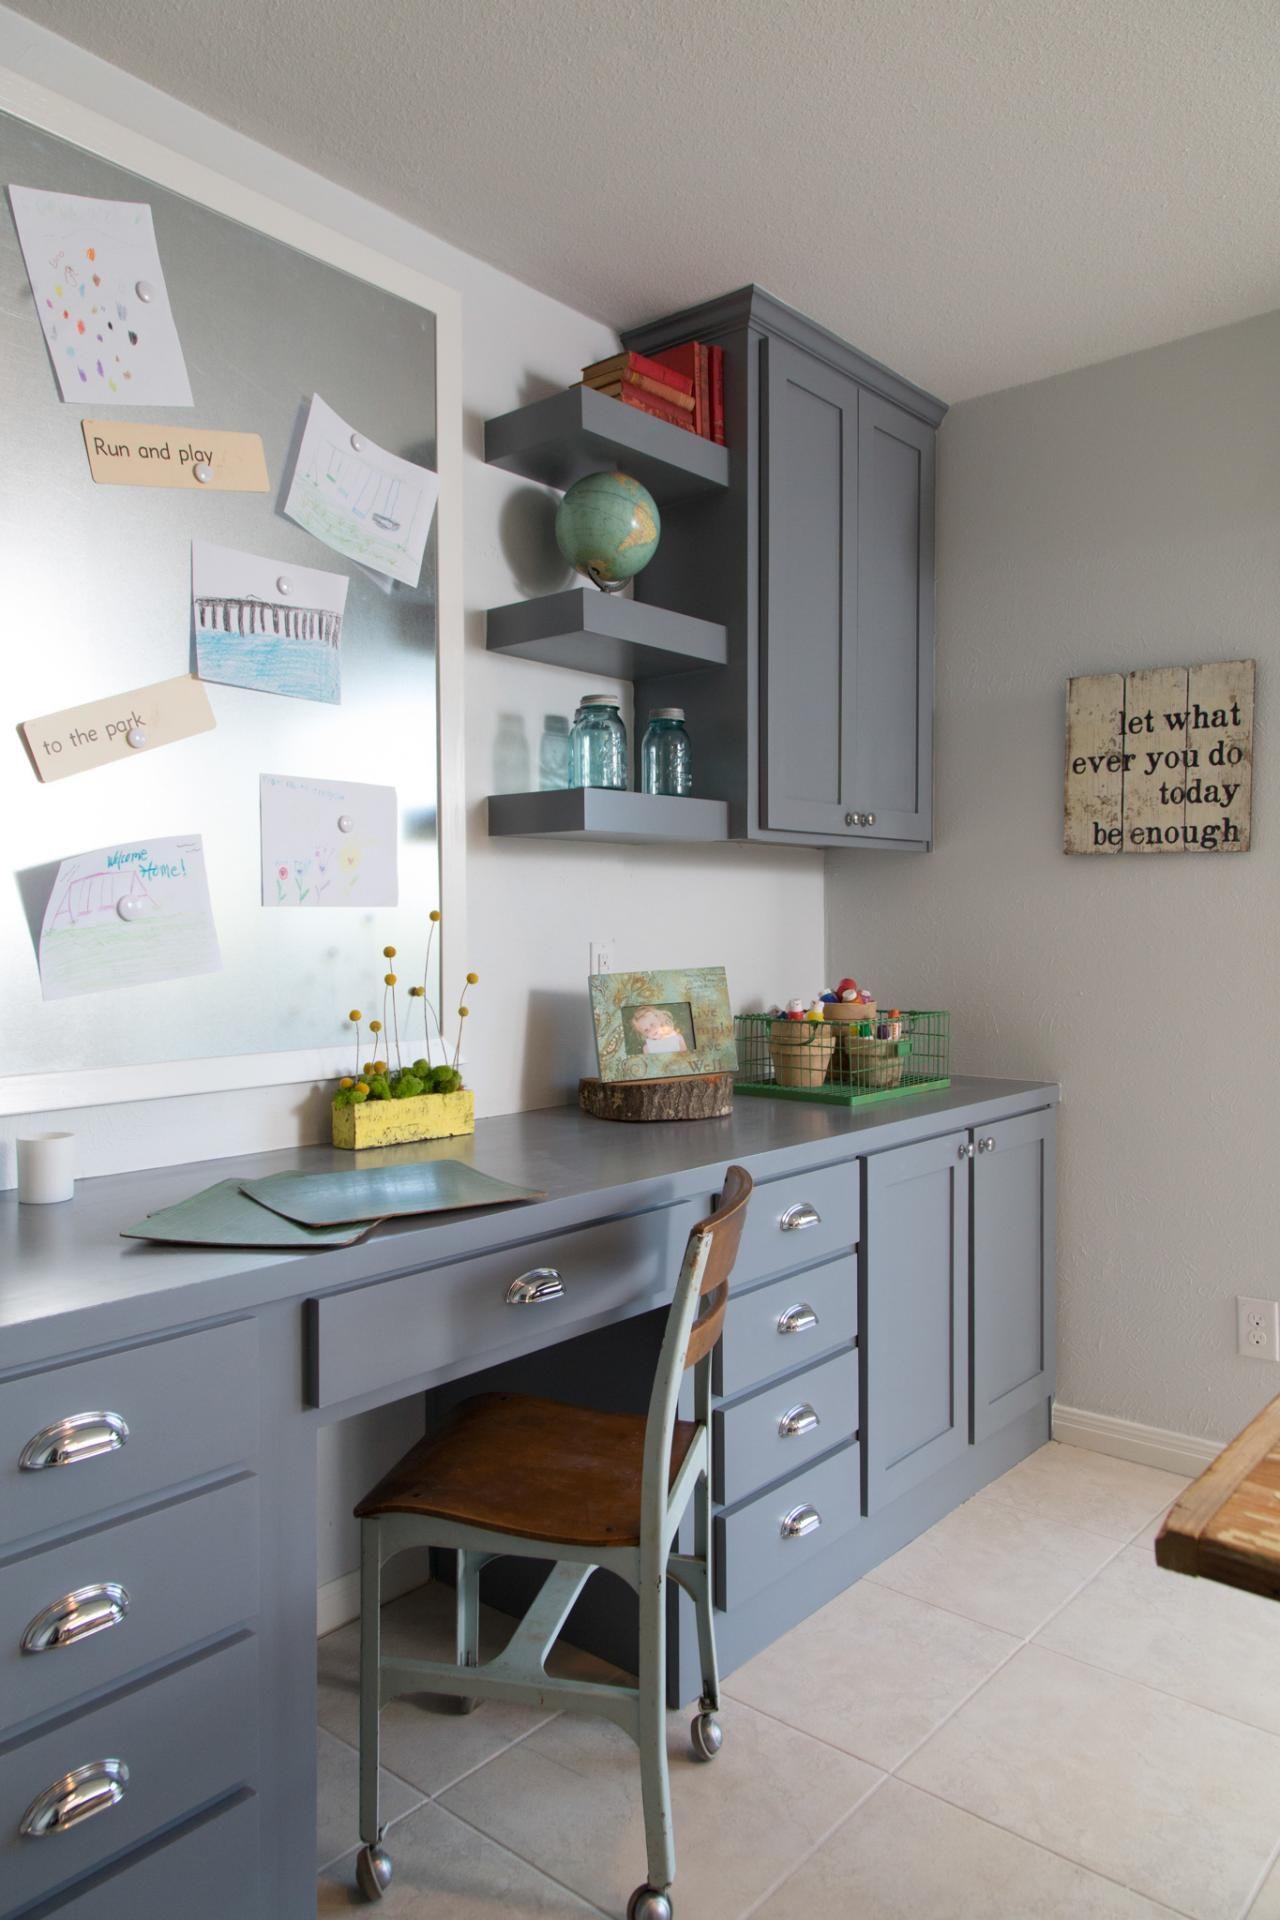 Joanna Gaines Fixer Upper Laundry Room Ideas